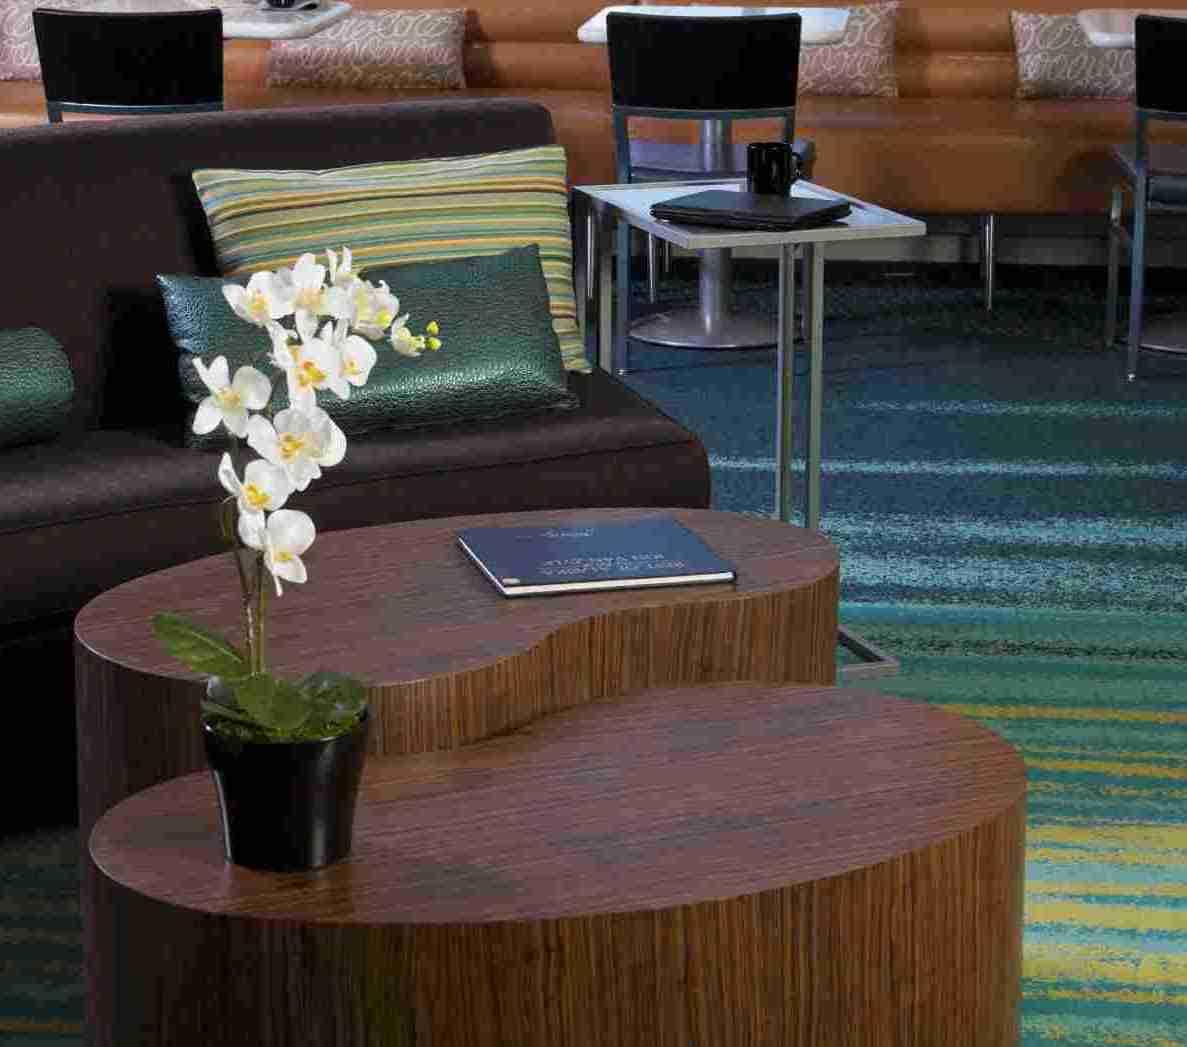 Northern Lights Tour accomodates: Springhill Suites in Fairbanks Alaksa